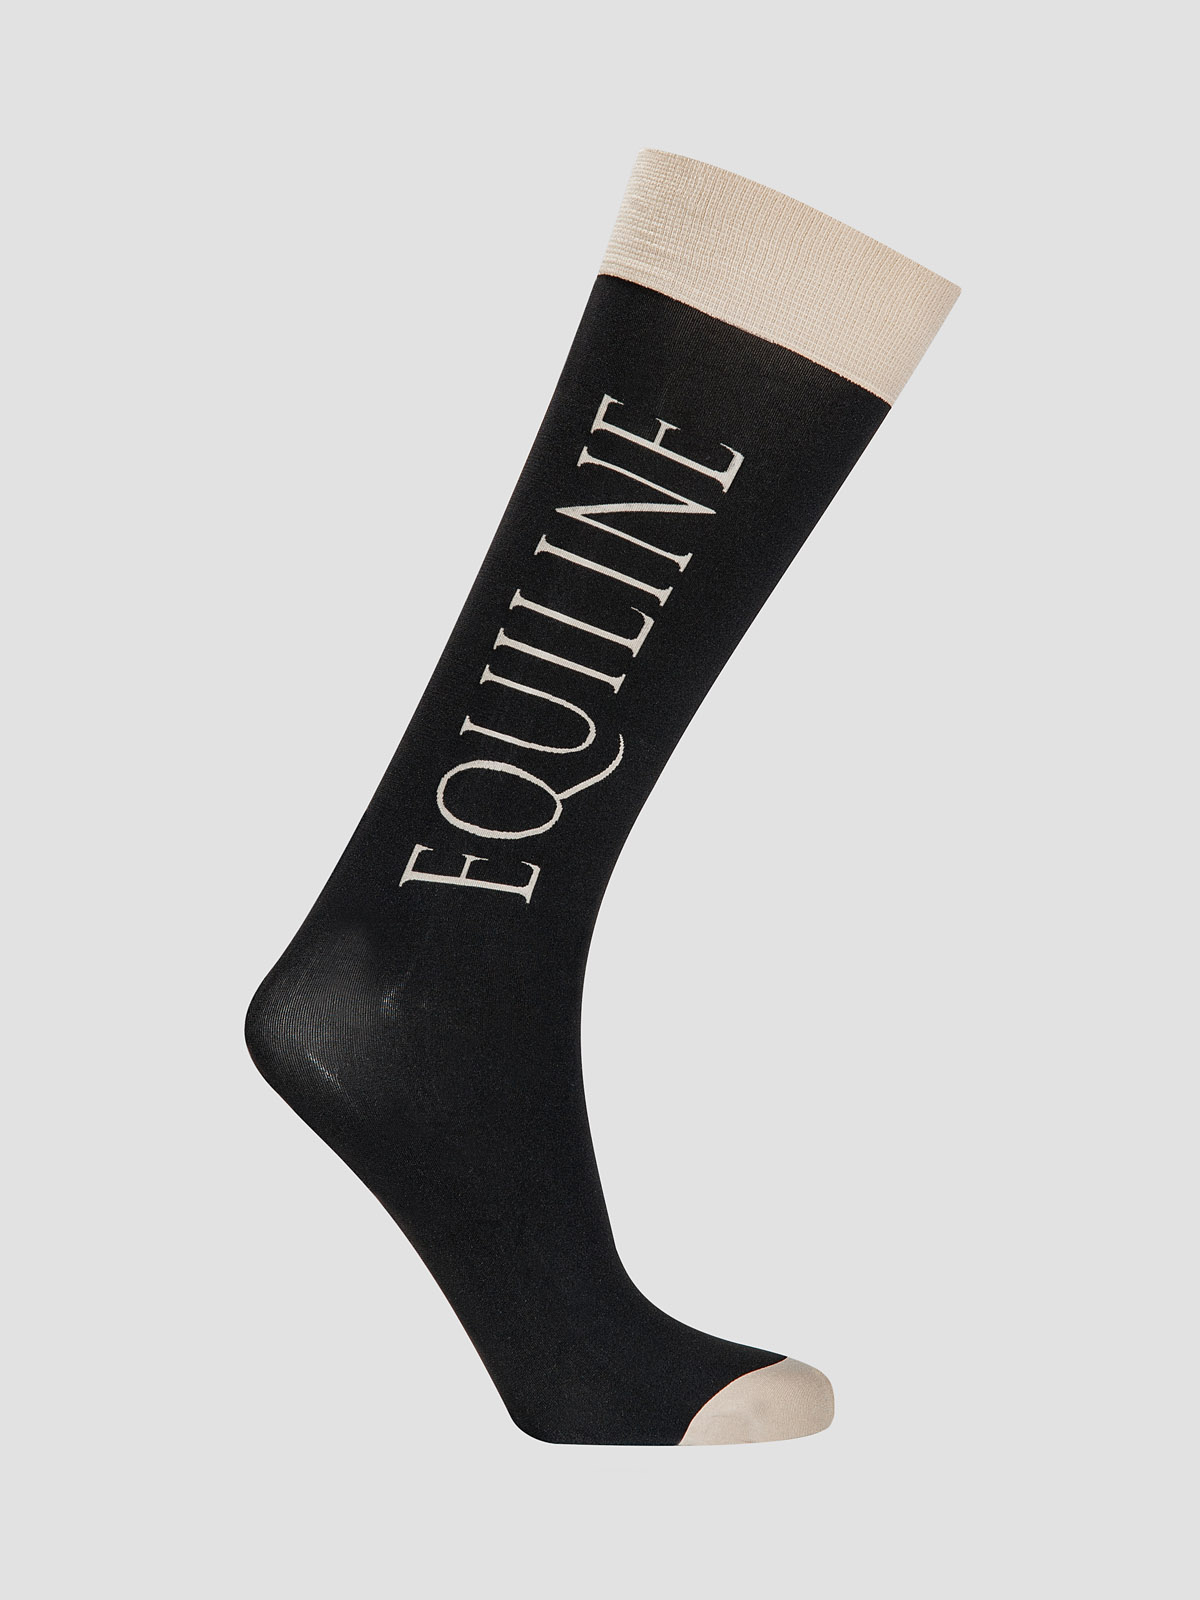 SOFTLY - Ultra-thin Microfibre Socks 1